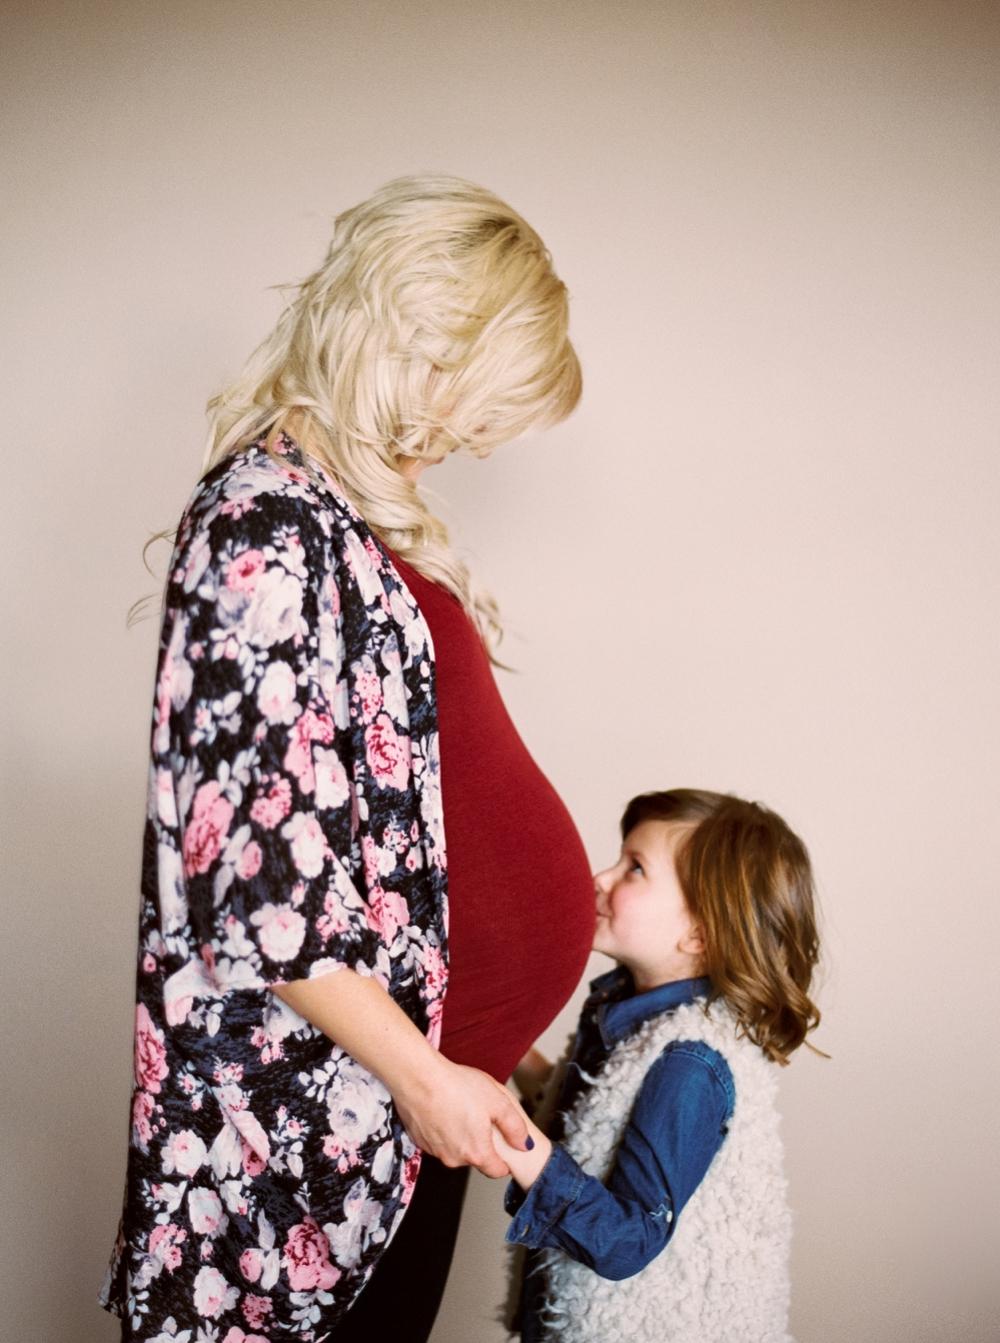 Calgary family photographer | Wedding blogger | Calgary wedding planner